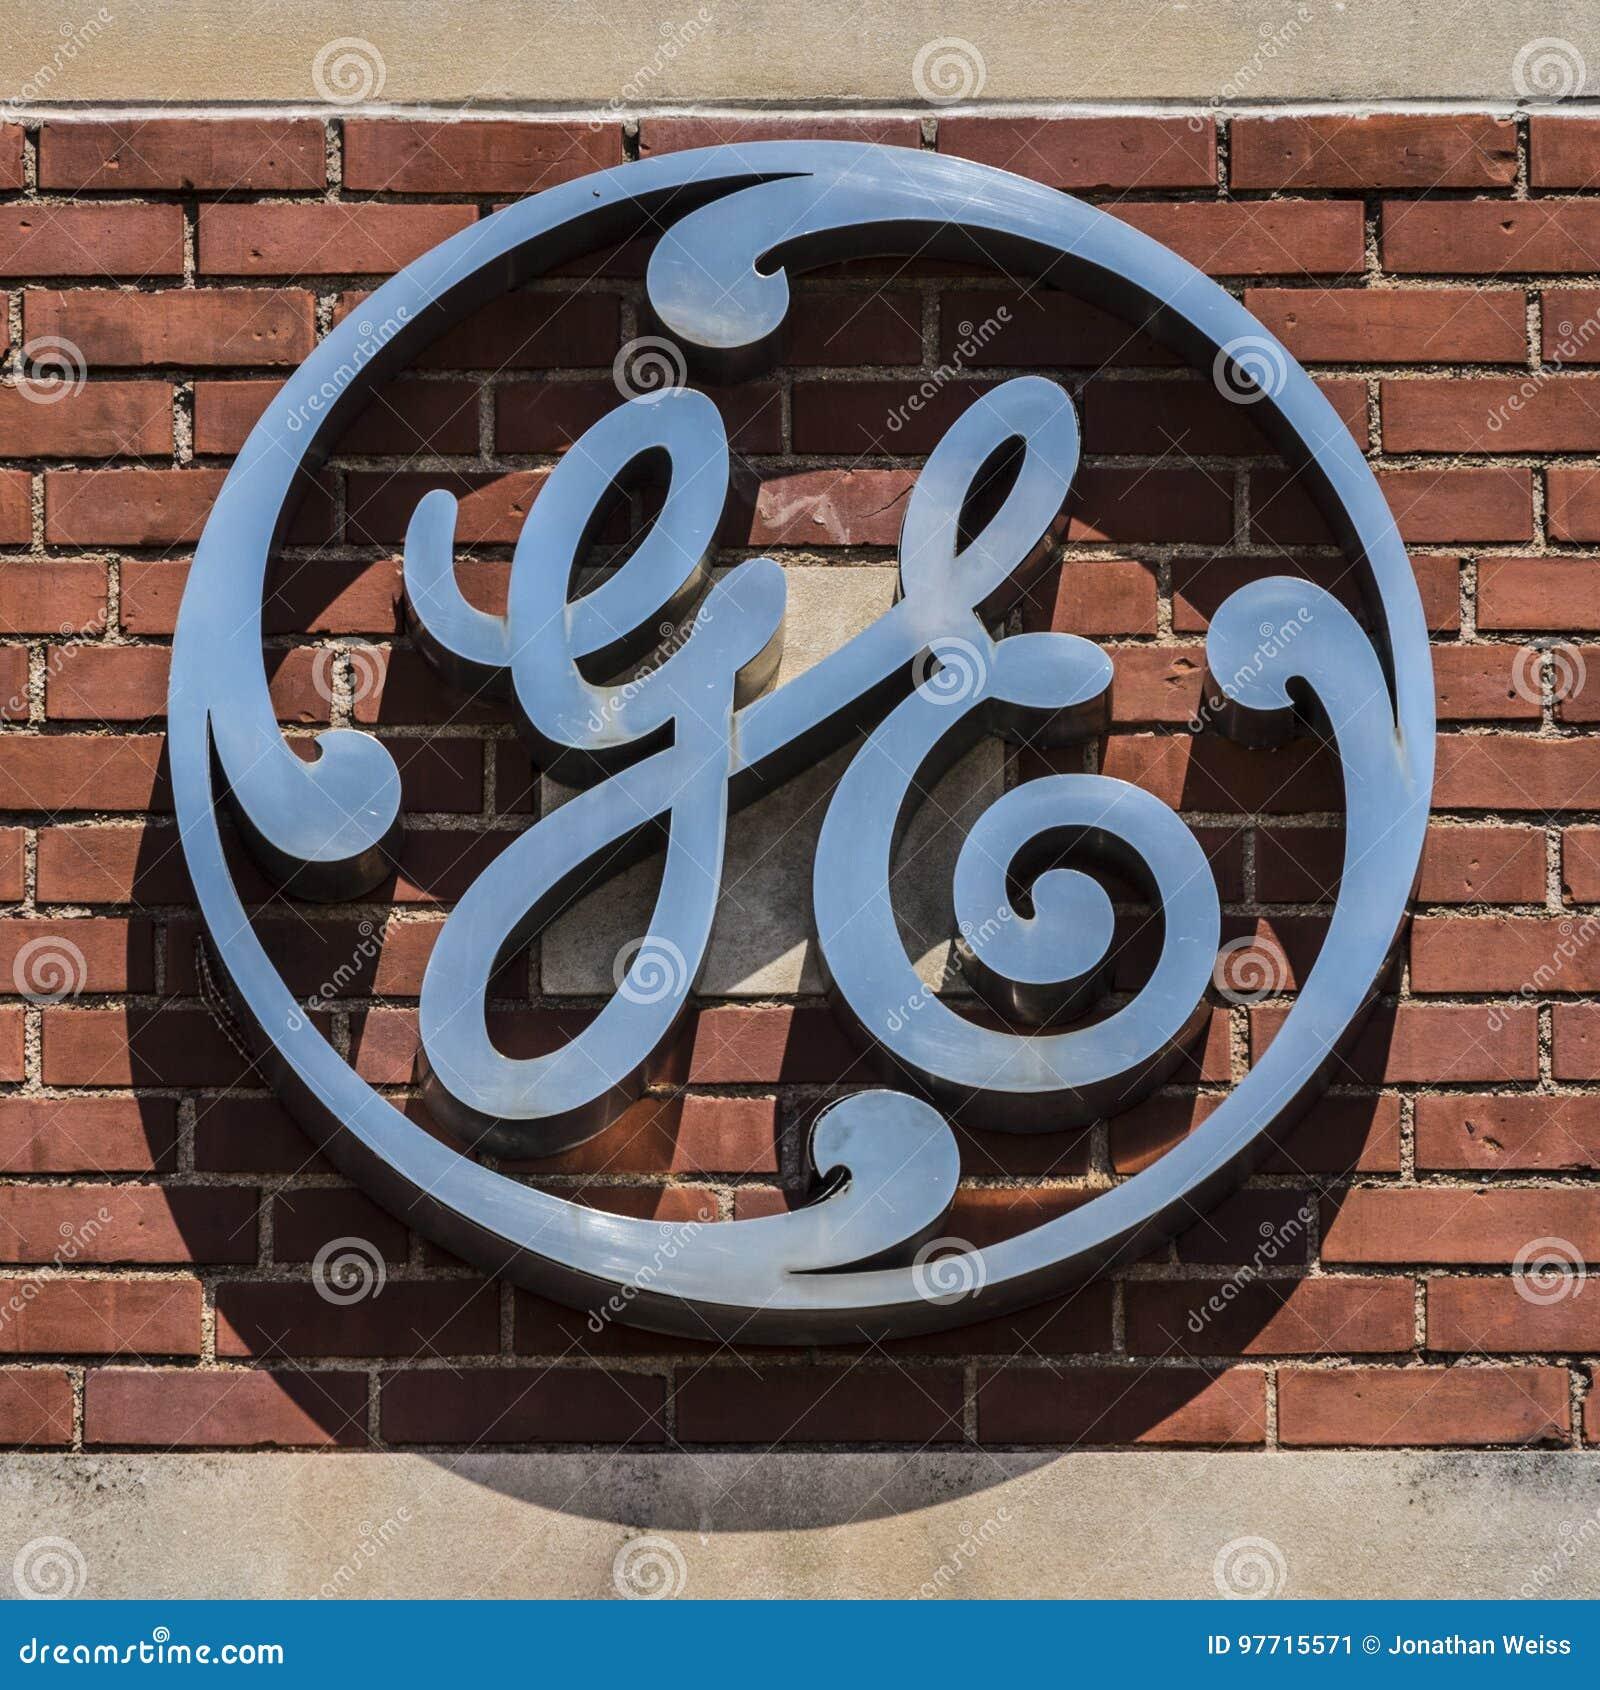 Ft  Wayne - Circa August 2017: General Electric Factory Logo  GE